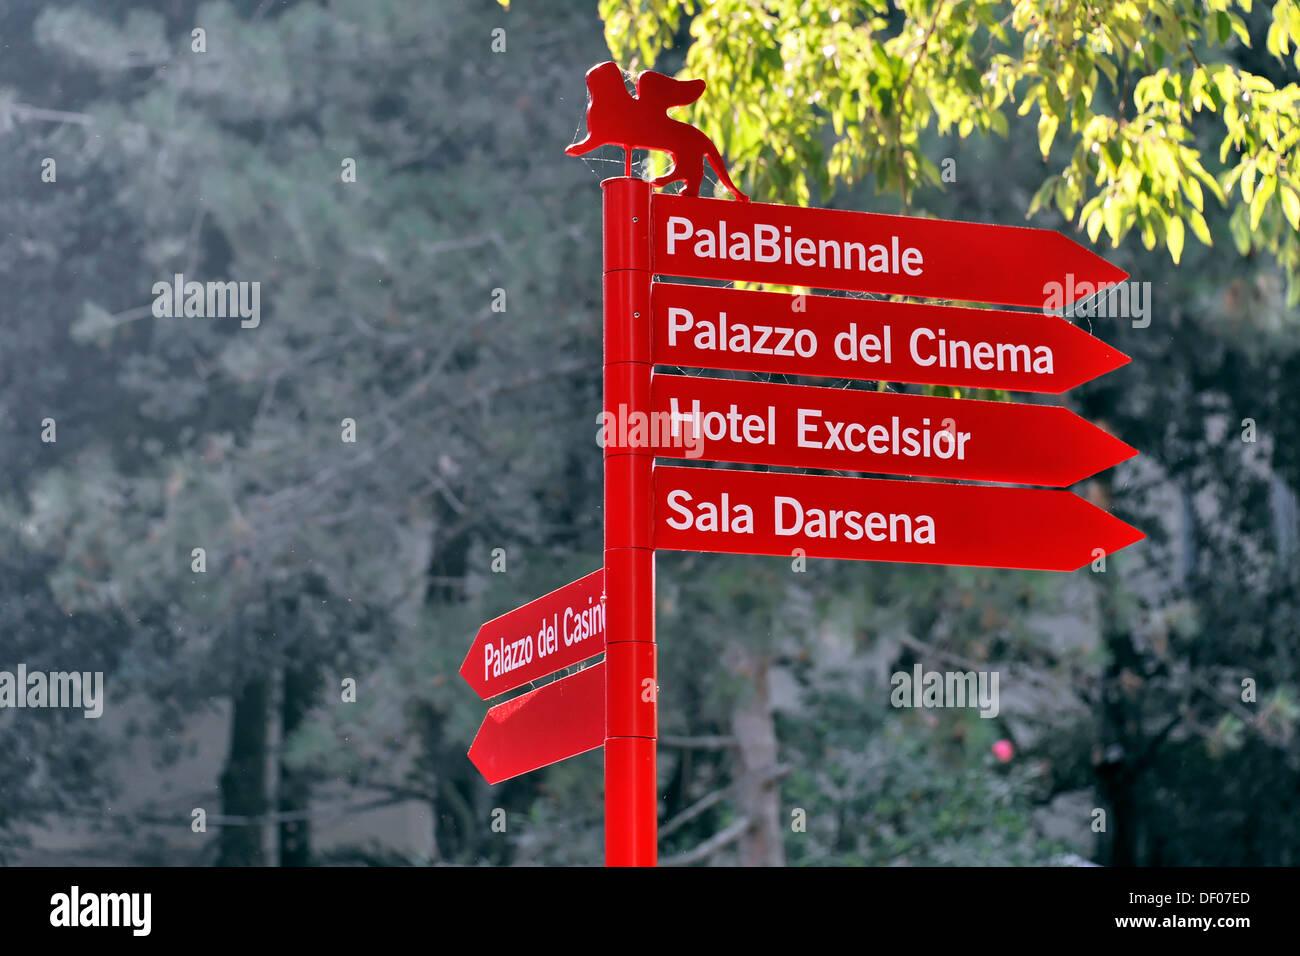 Signpost, Biennale di Venezia 2011, Venice, Veneto, Italy, Europe - Stock Image